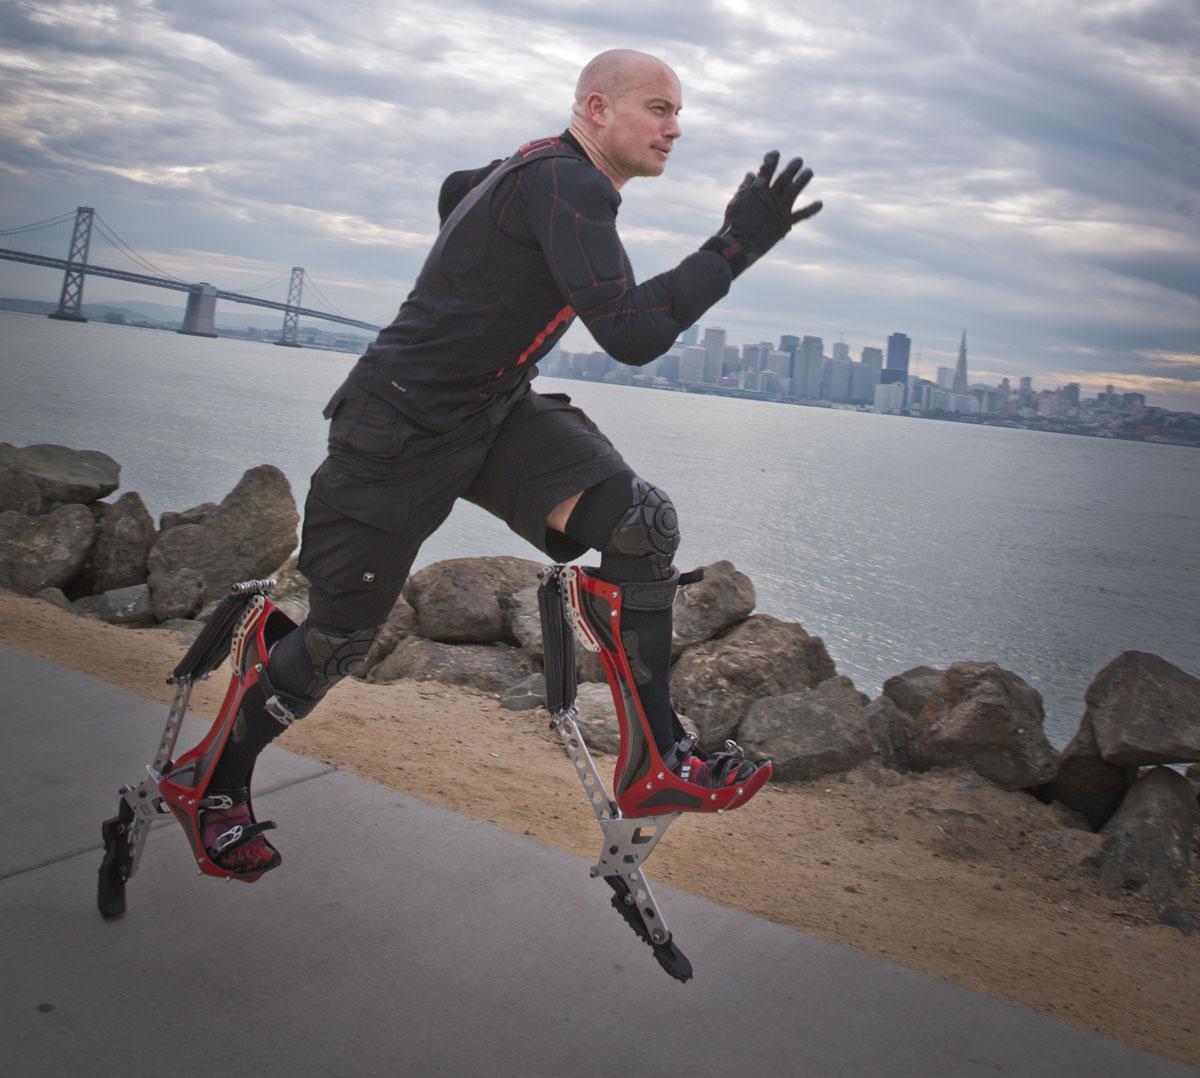 World's Fastest Man: How I Built Bionic Boots